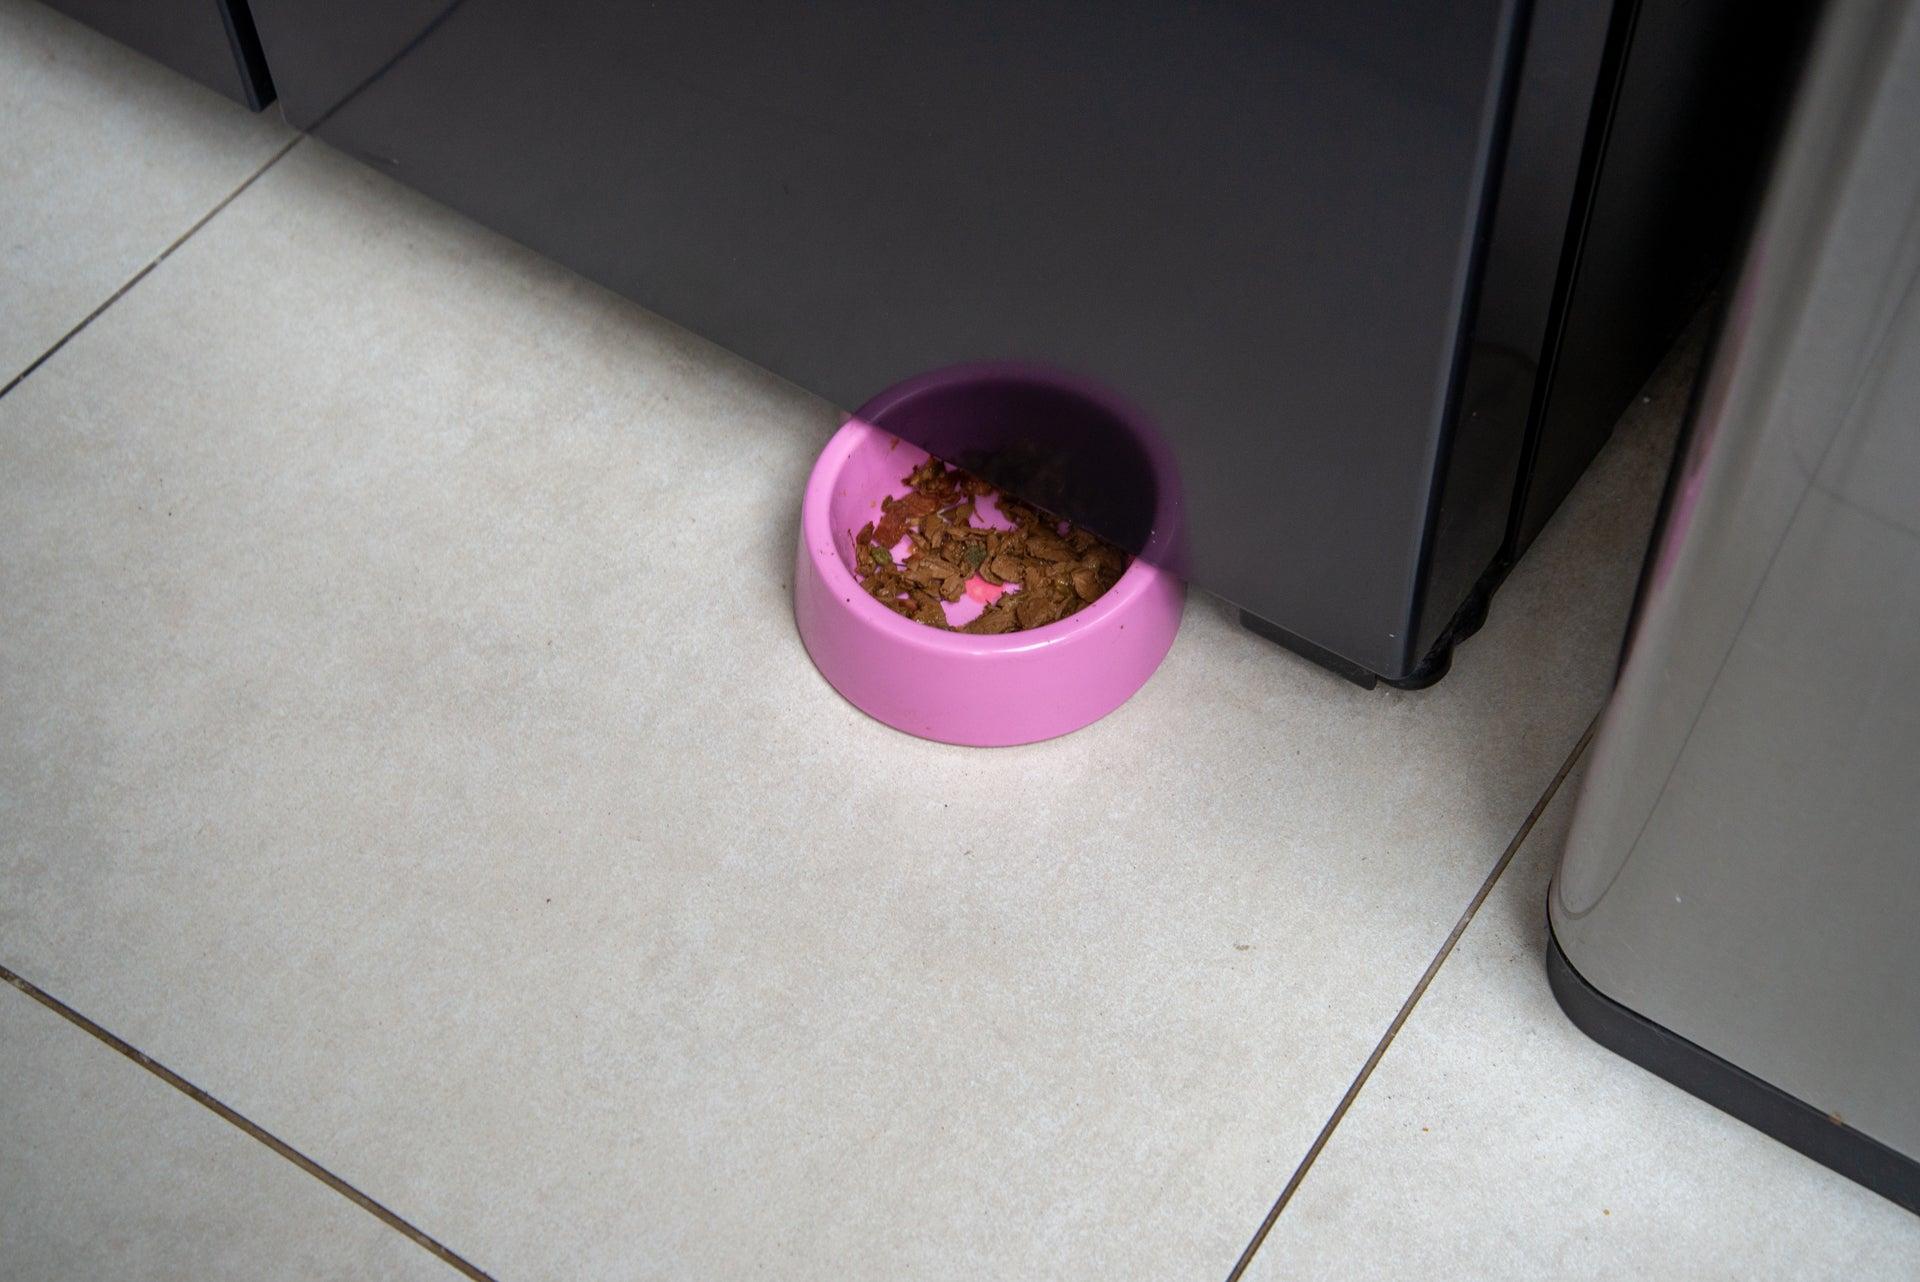 Roborock S6 MaxV pet bowl moved